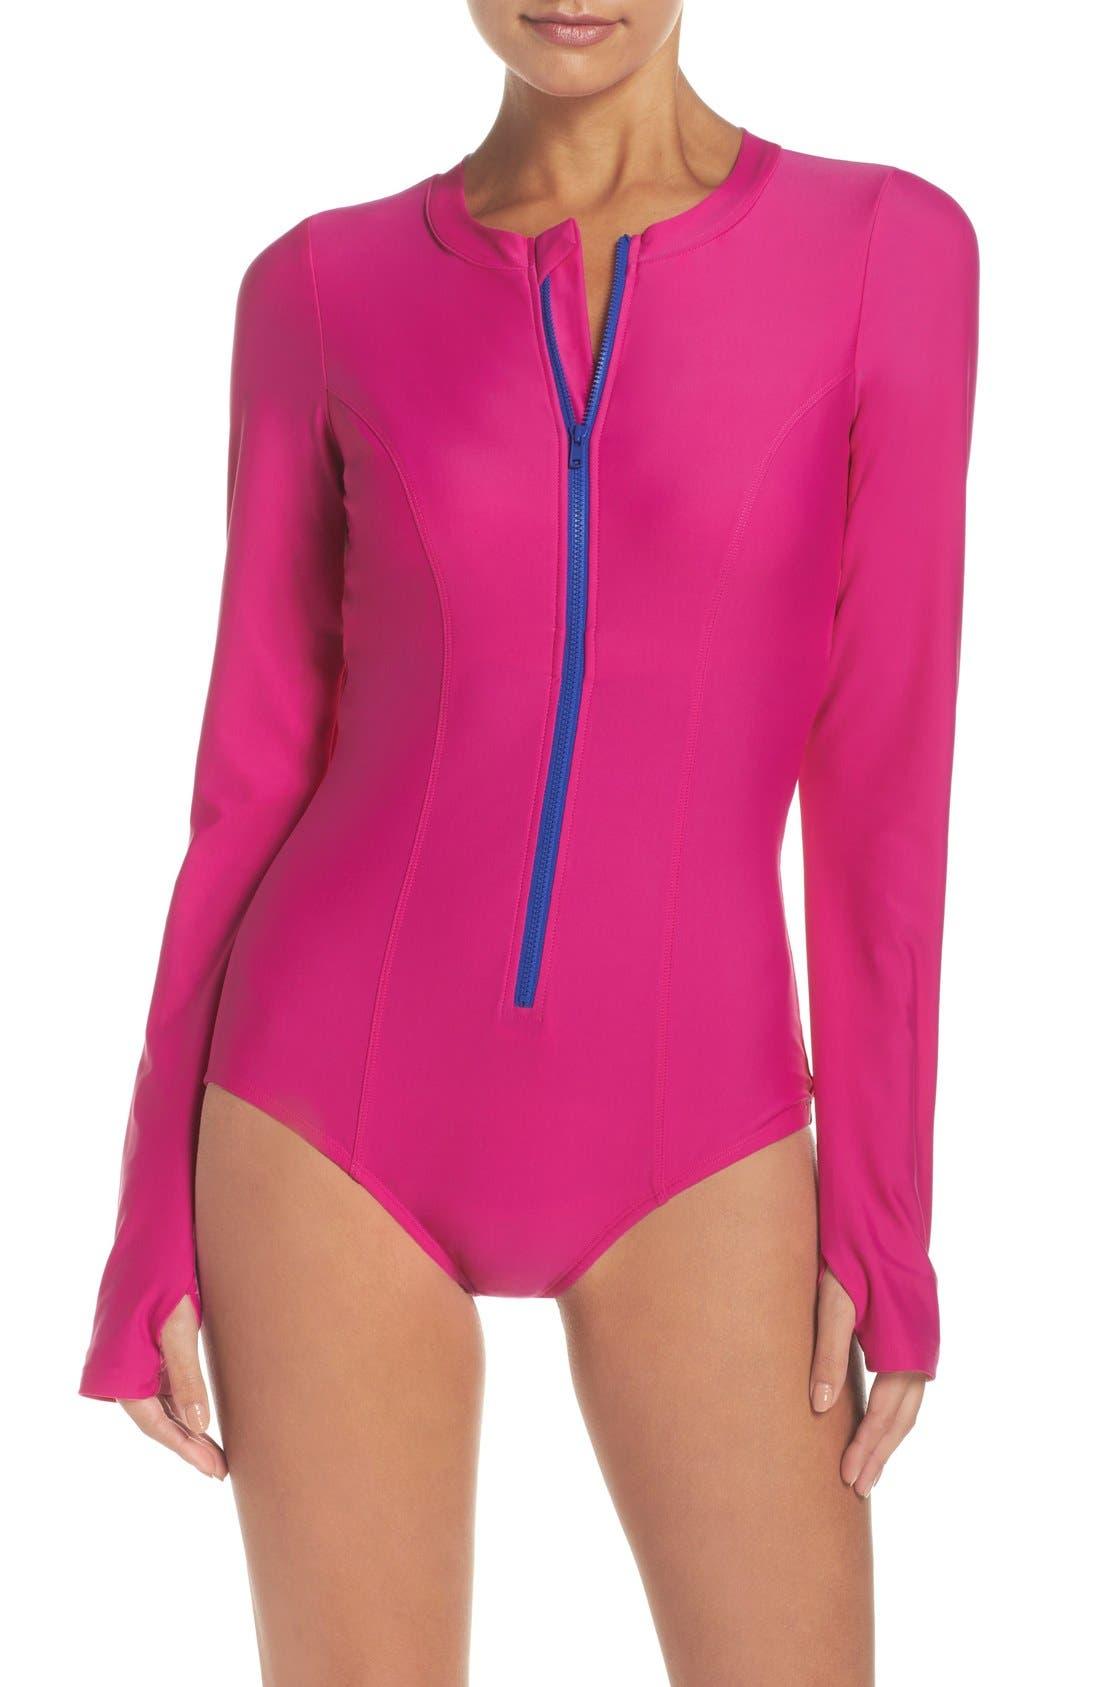 Alternate Image 1 Selected - Mott 50 Long Sleeve One-Piece Swimsuit (UPF 50)